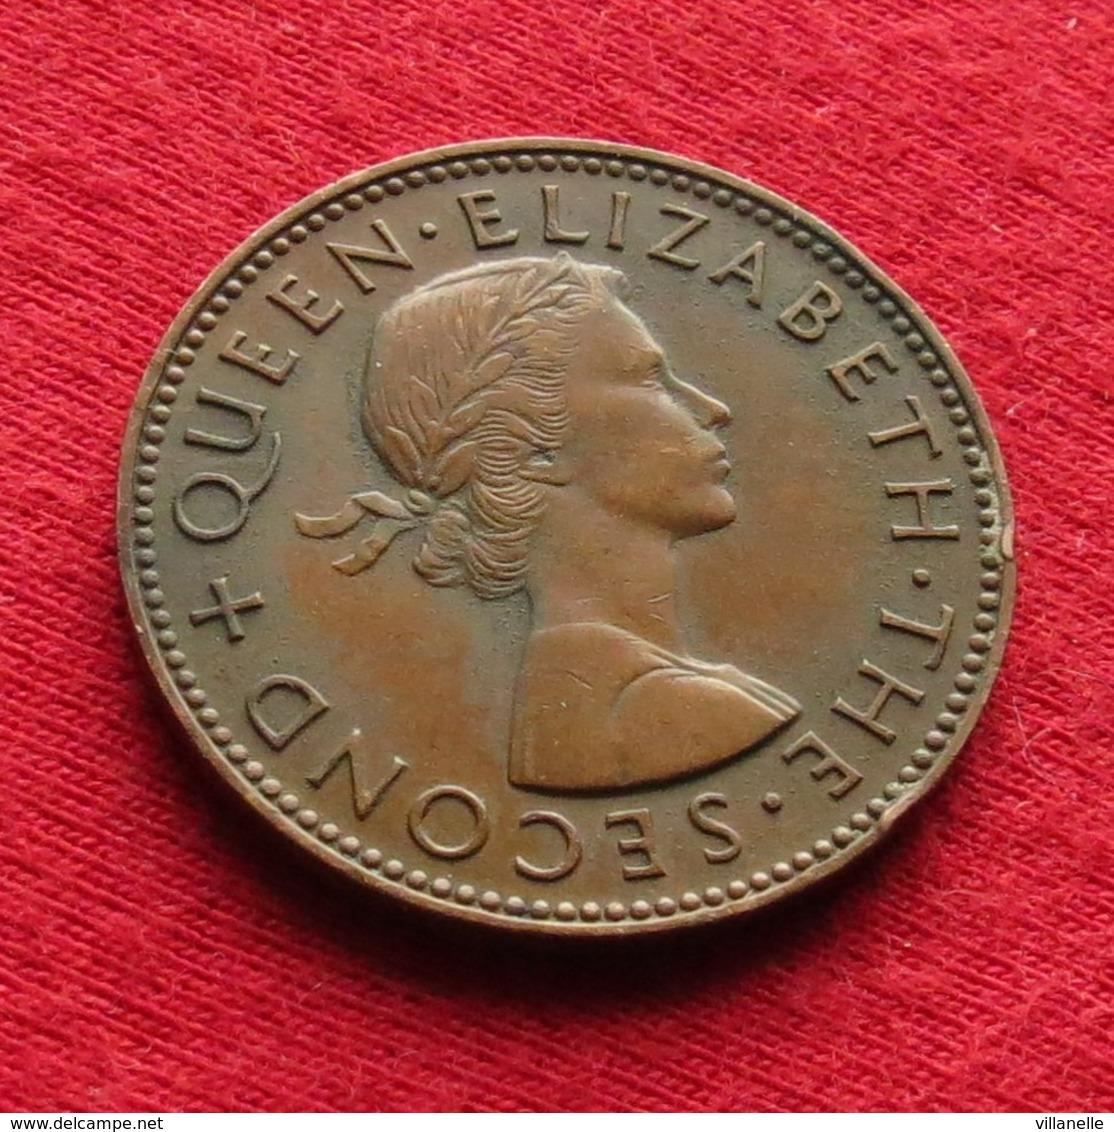 New Zealand 1/2 Half Penny 1958  Nova Zelandia Nuova Zelanda Nouvelle Zelande #2 Wº - Nueva Zelanda